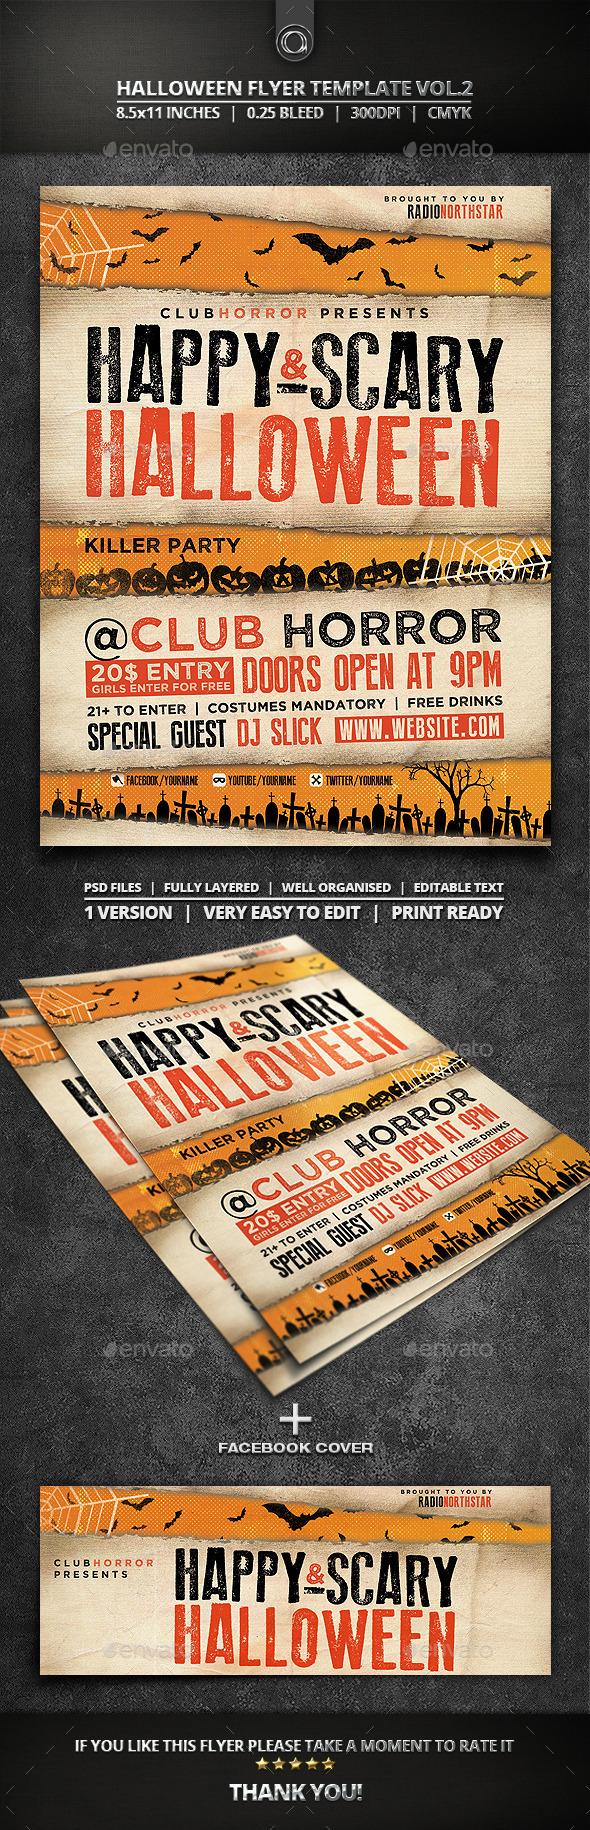 Halloween Flyer Template Vol.2 - Events Flyers